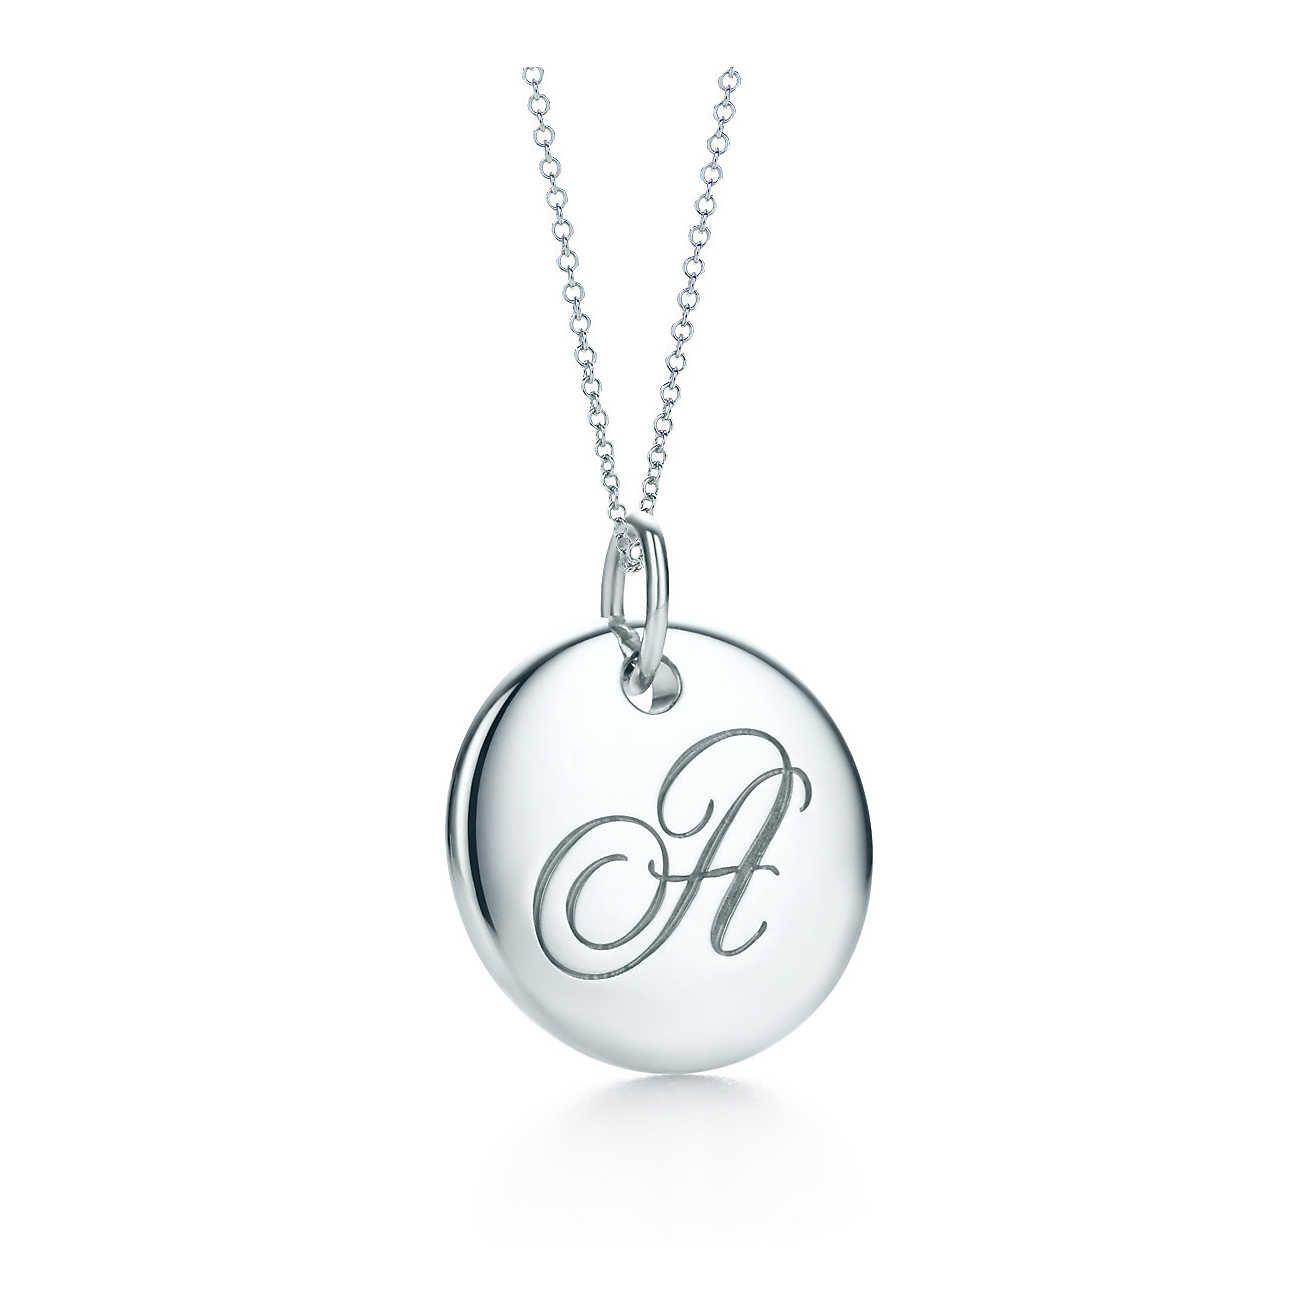 Tiffany notes alphabet disc charm pendant tiffany pendants and chains tiffany notesbralphabet disc charm pendant aloadofball Image collections